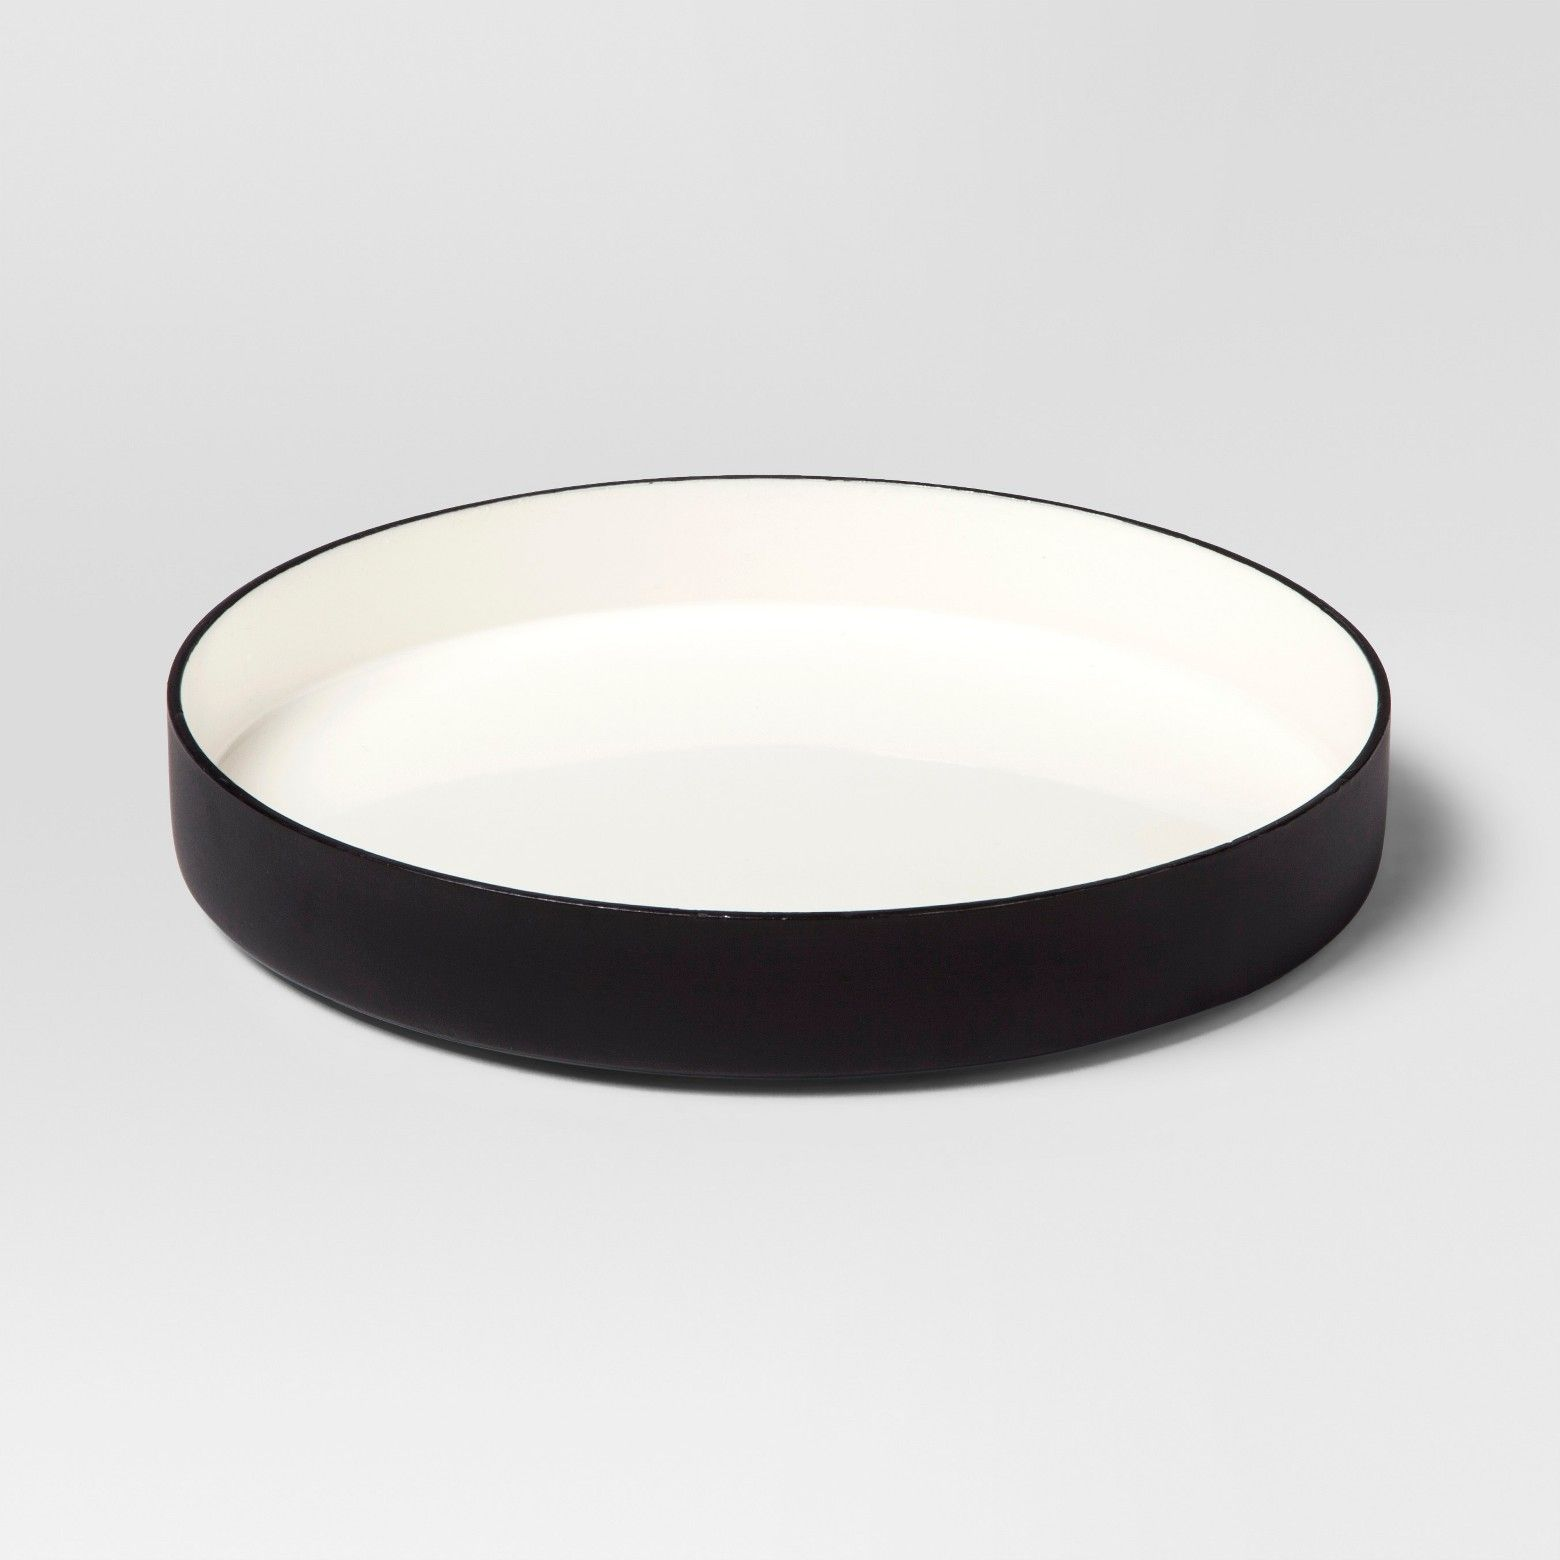 Black Decorative Tray Amusing Enamel Tray Small  Whiteblack  Project 62  Small Tray Black Design Inspiration